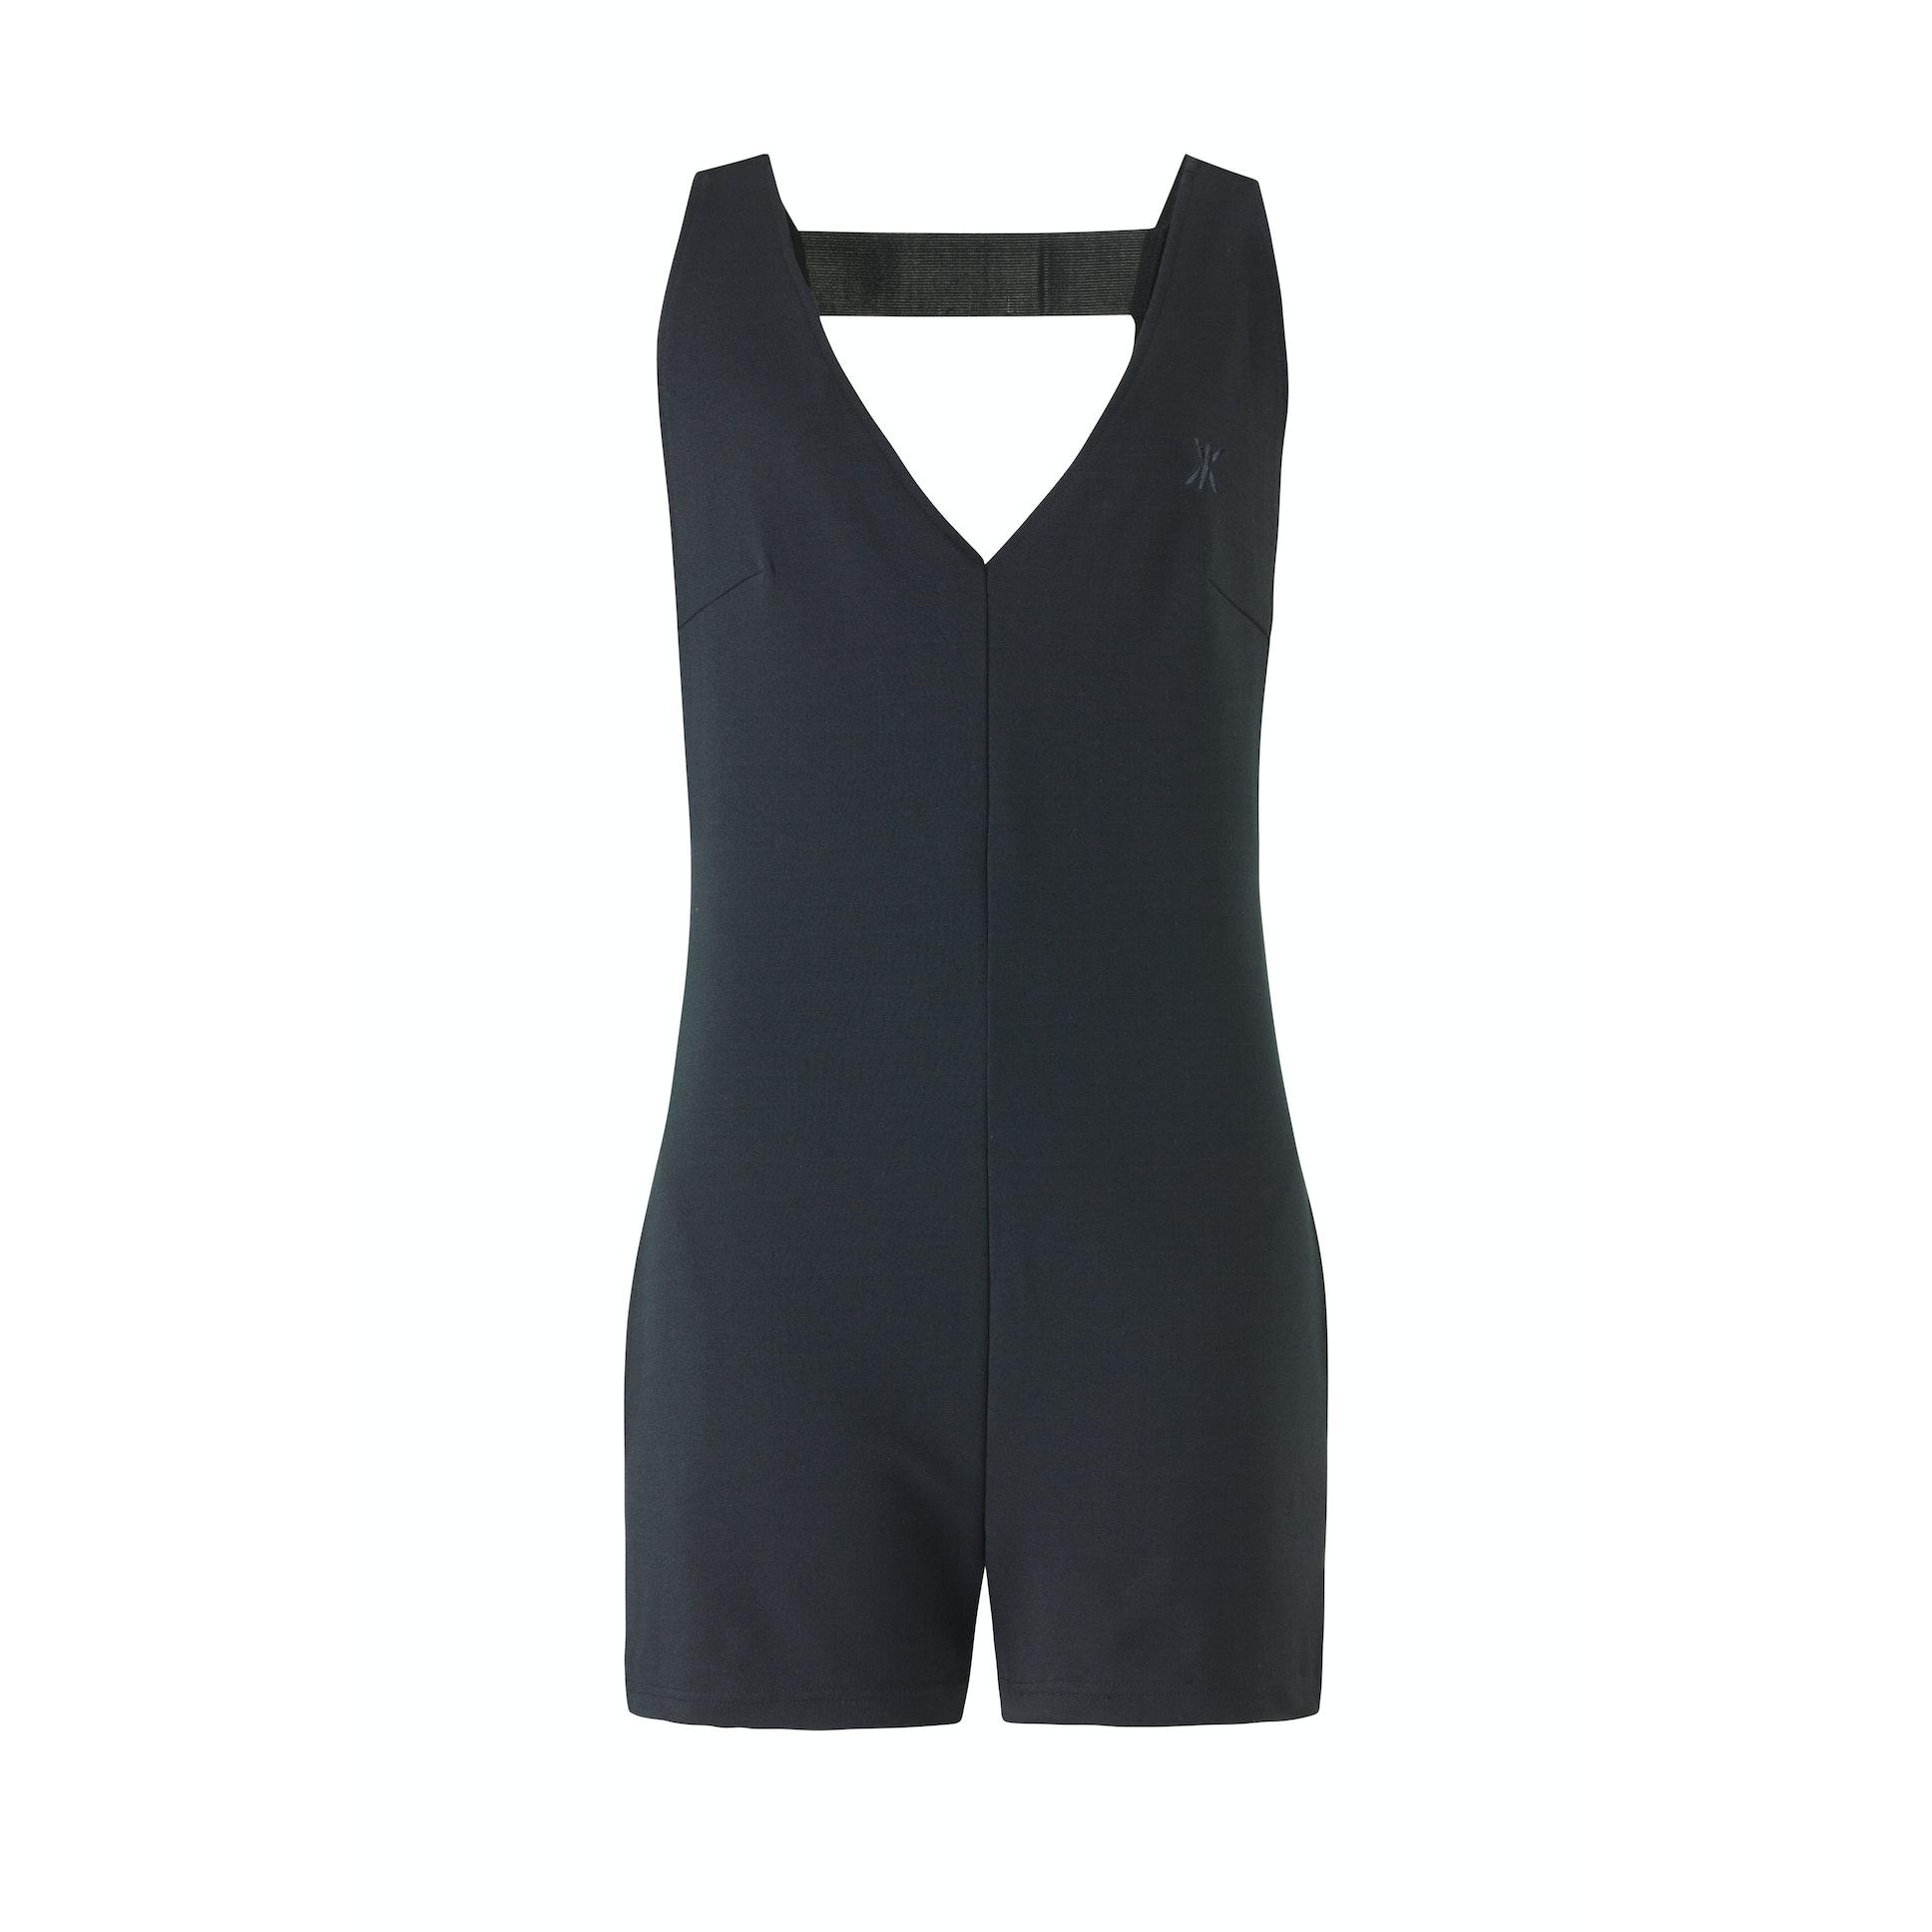 a8be787a765 bay-short-jumpsuit-black-2.jpg w 1936 h 1936 fit fill bg FFFFFF q 75